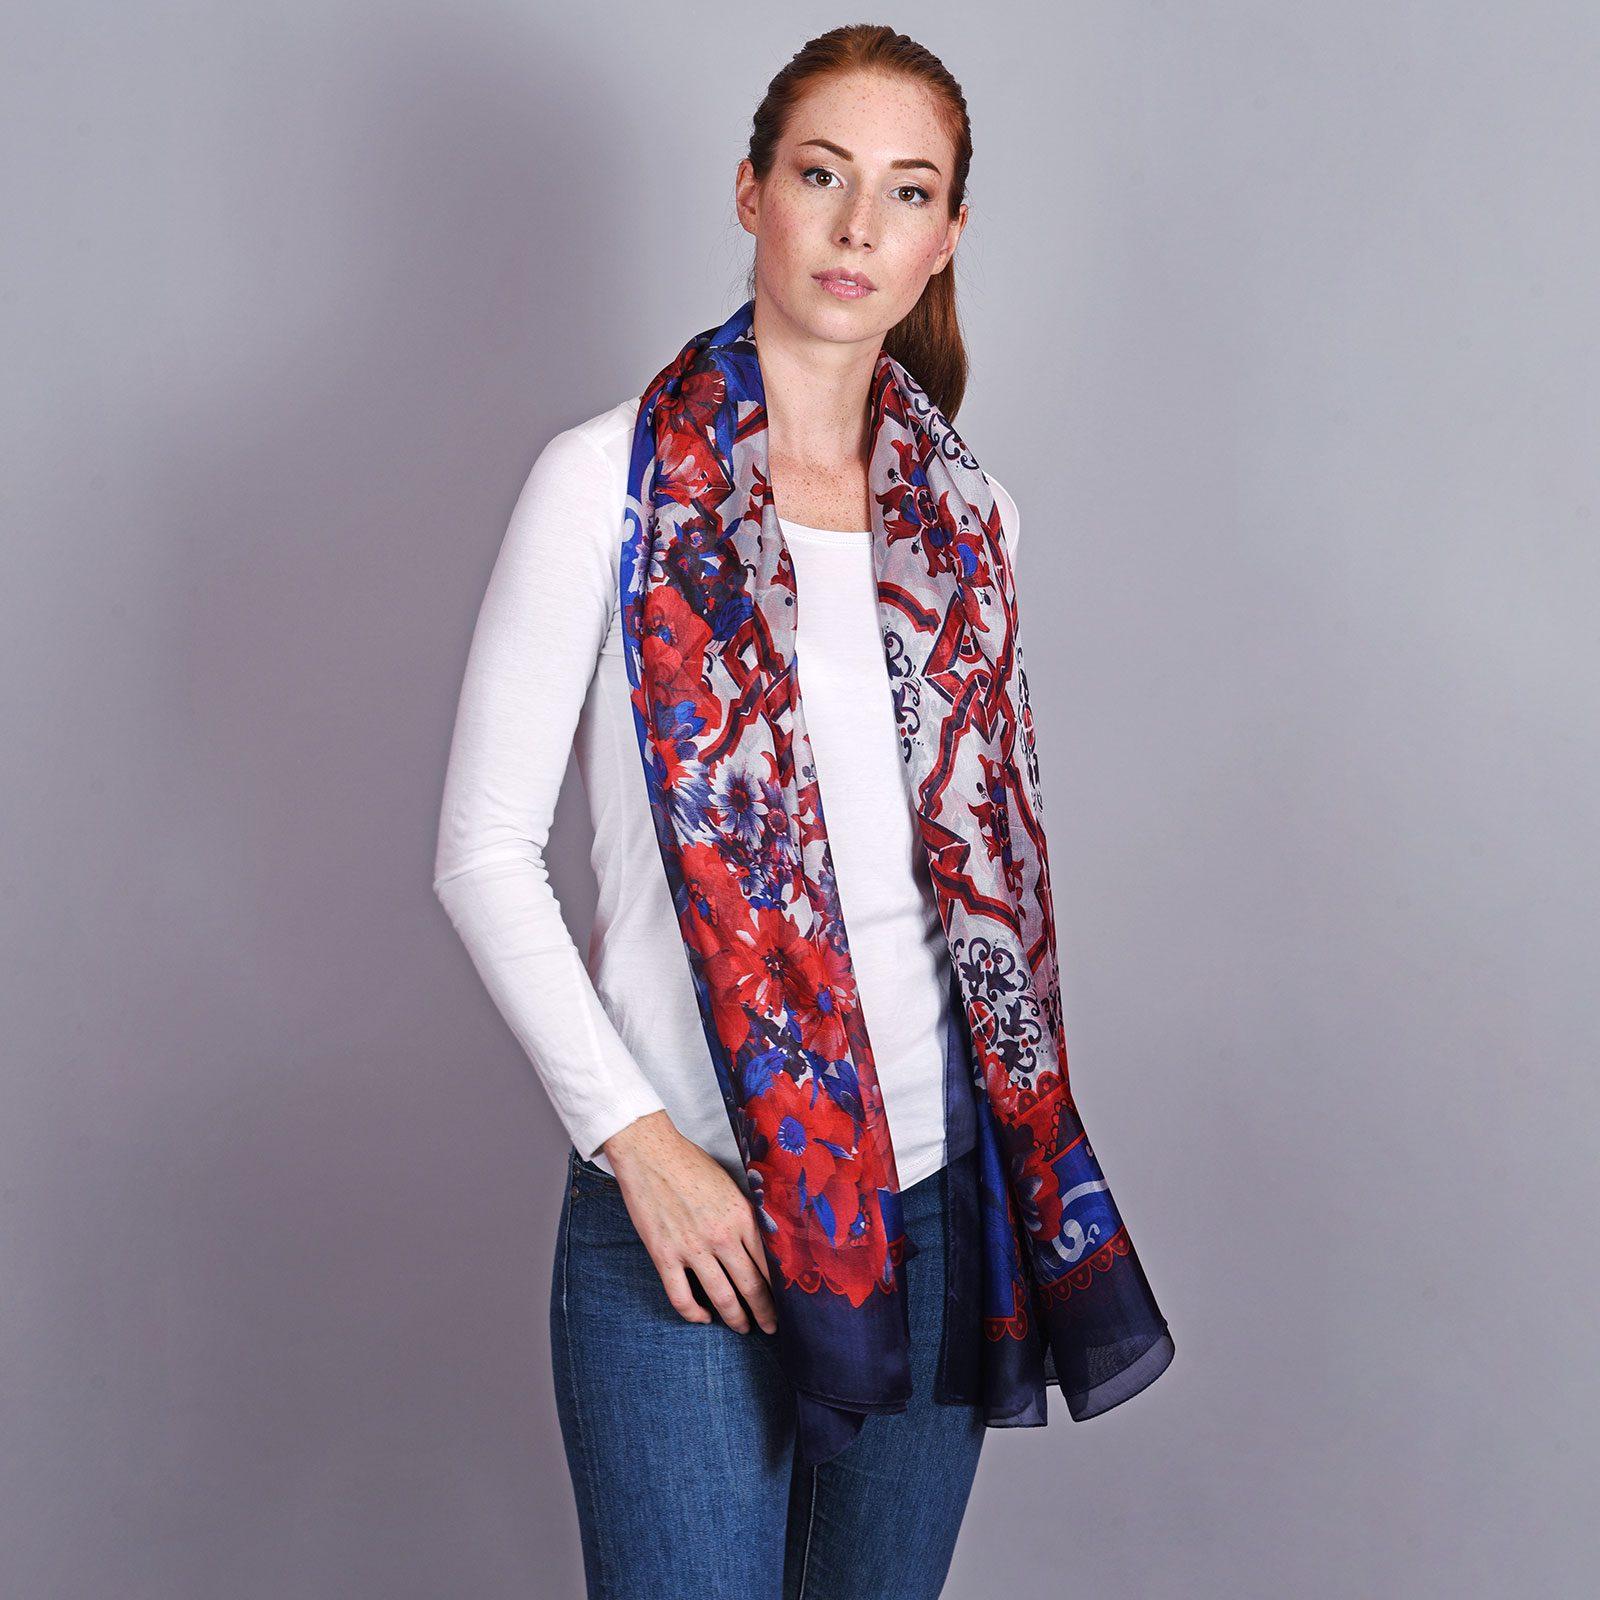 http://lookbook.allee-du-foulard.fr/wp-content/uploads/2018/11/AT-04577-VF16-2-etole-soie-fleurs-bleu-marine-1600x1600.jpg